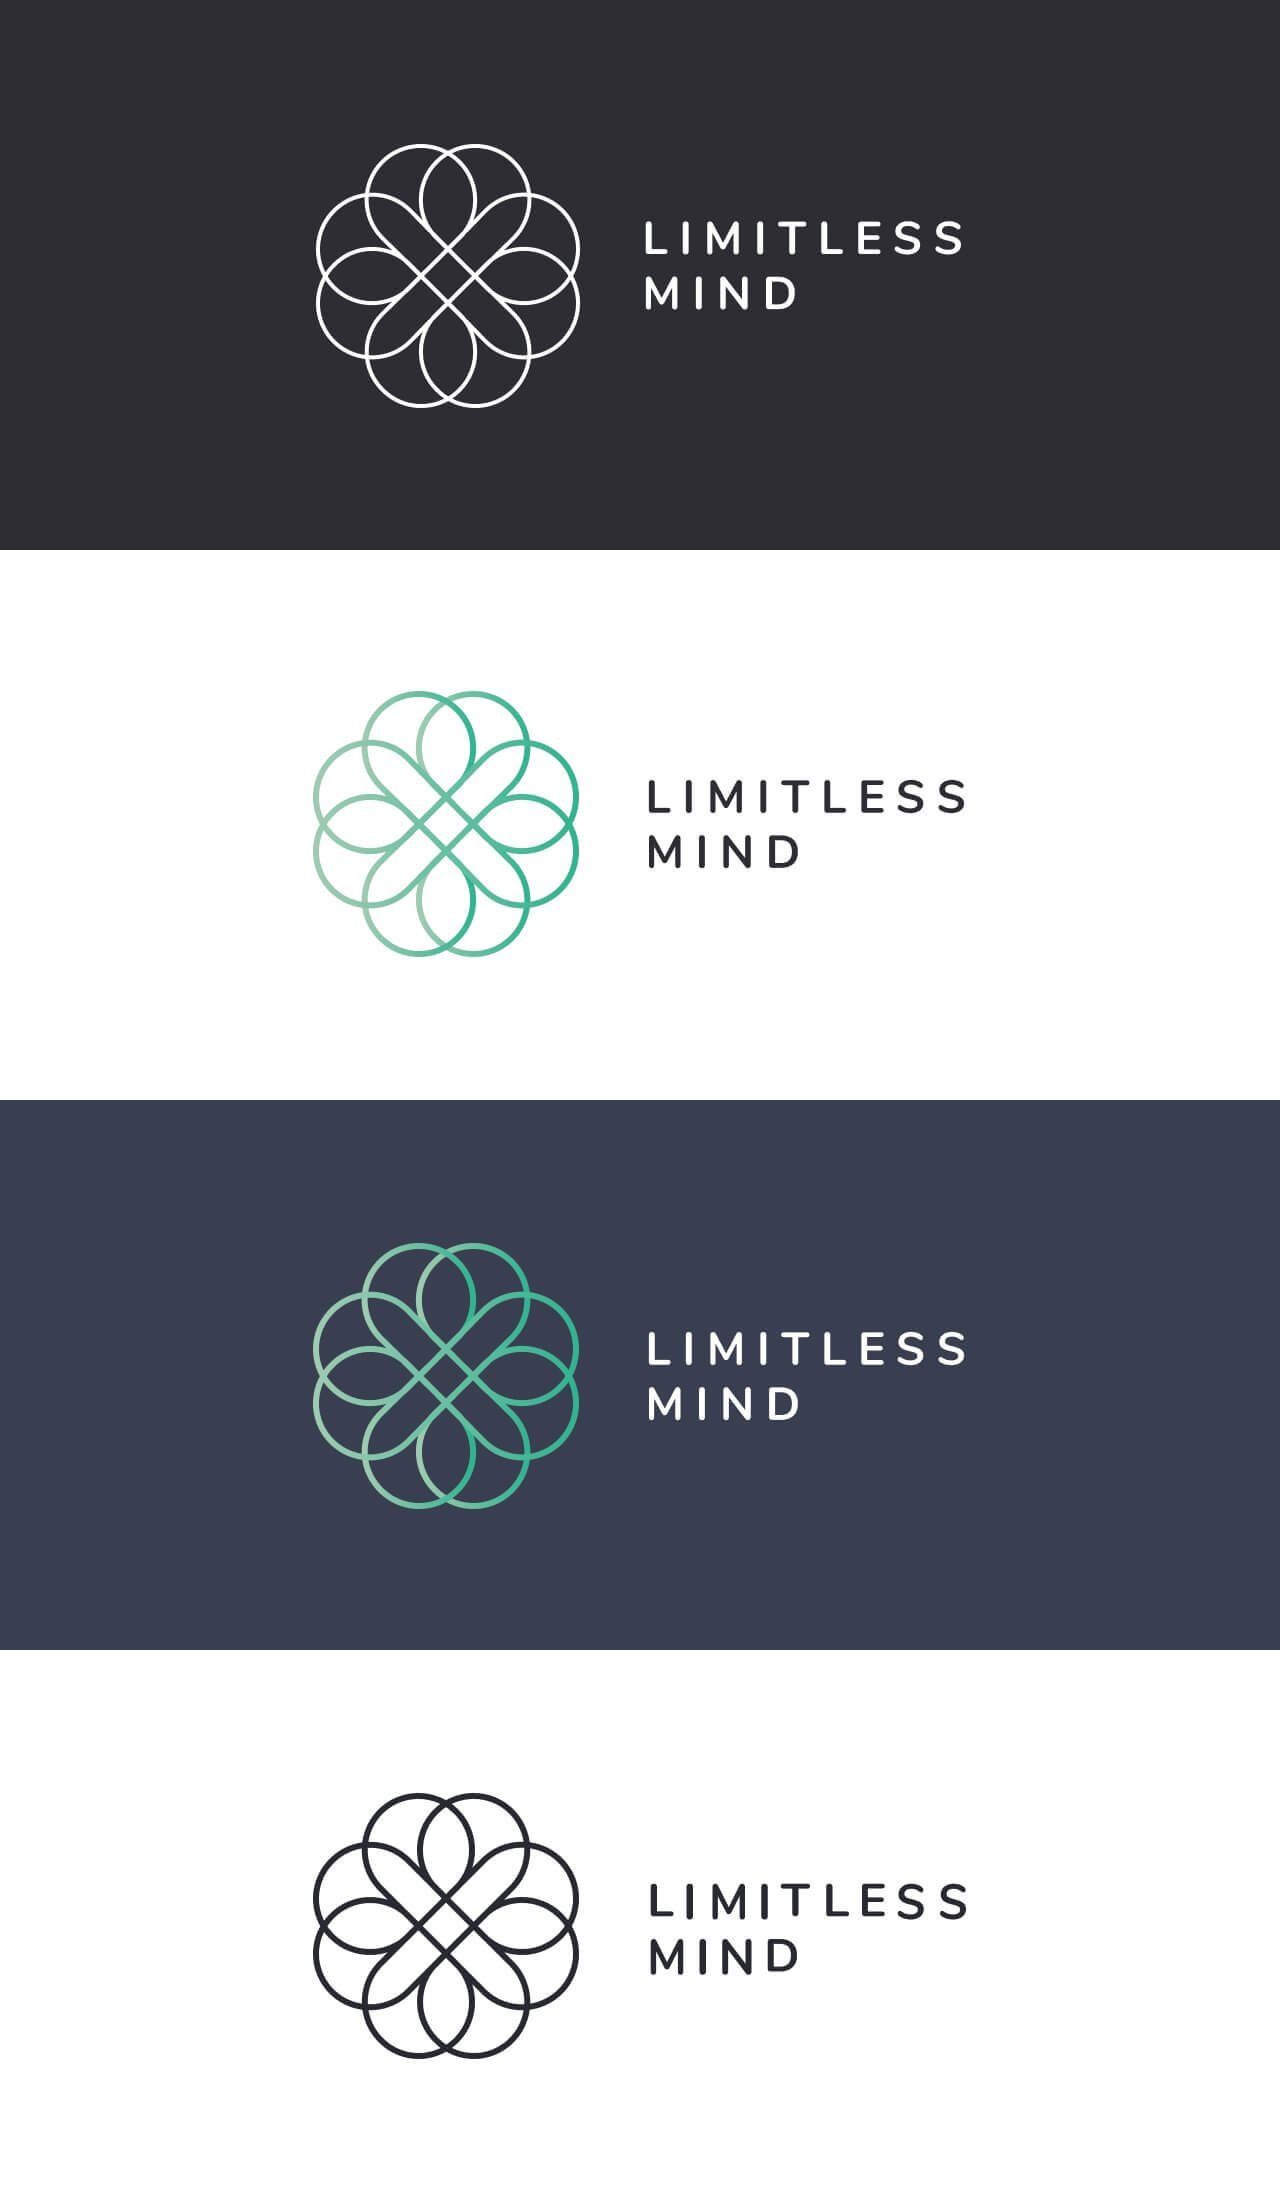 Group 2s163 Limitless Mind 3 Baasbox